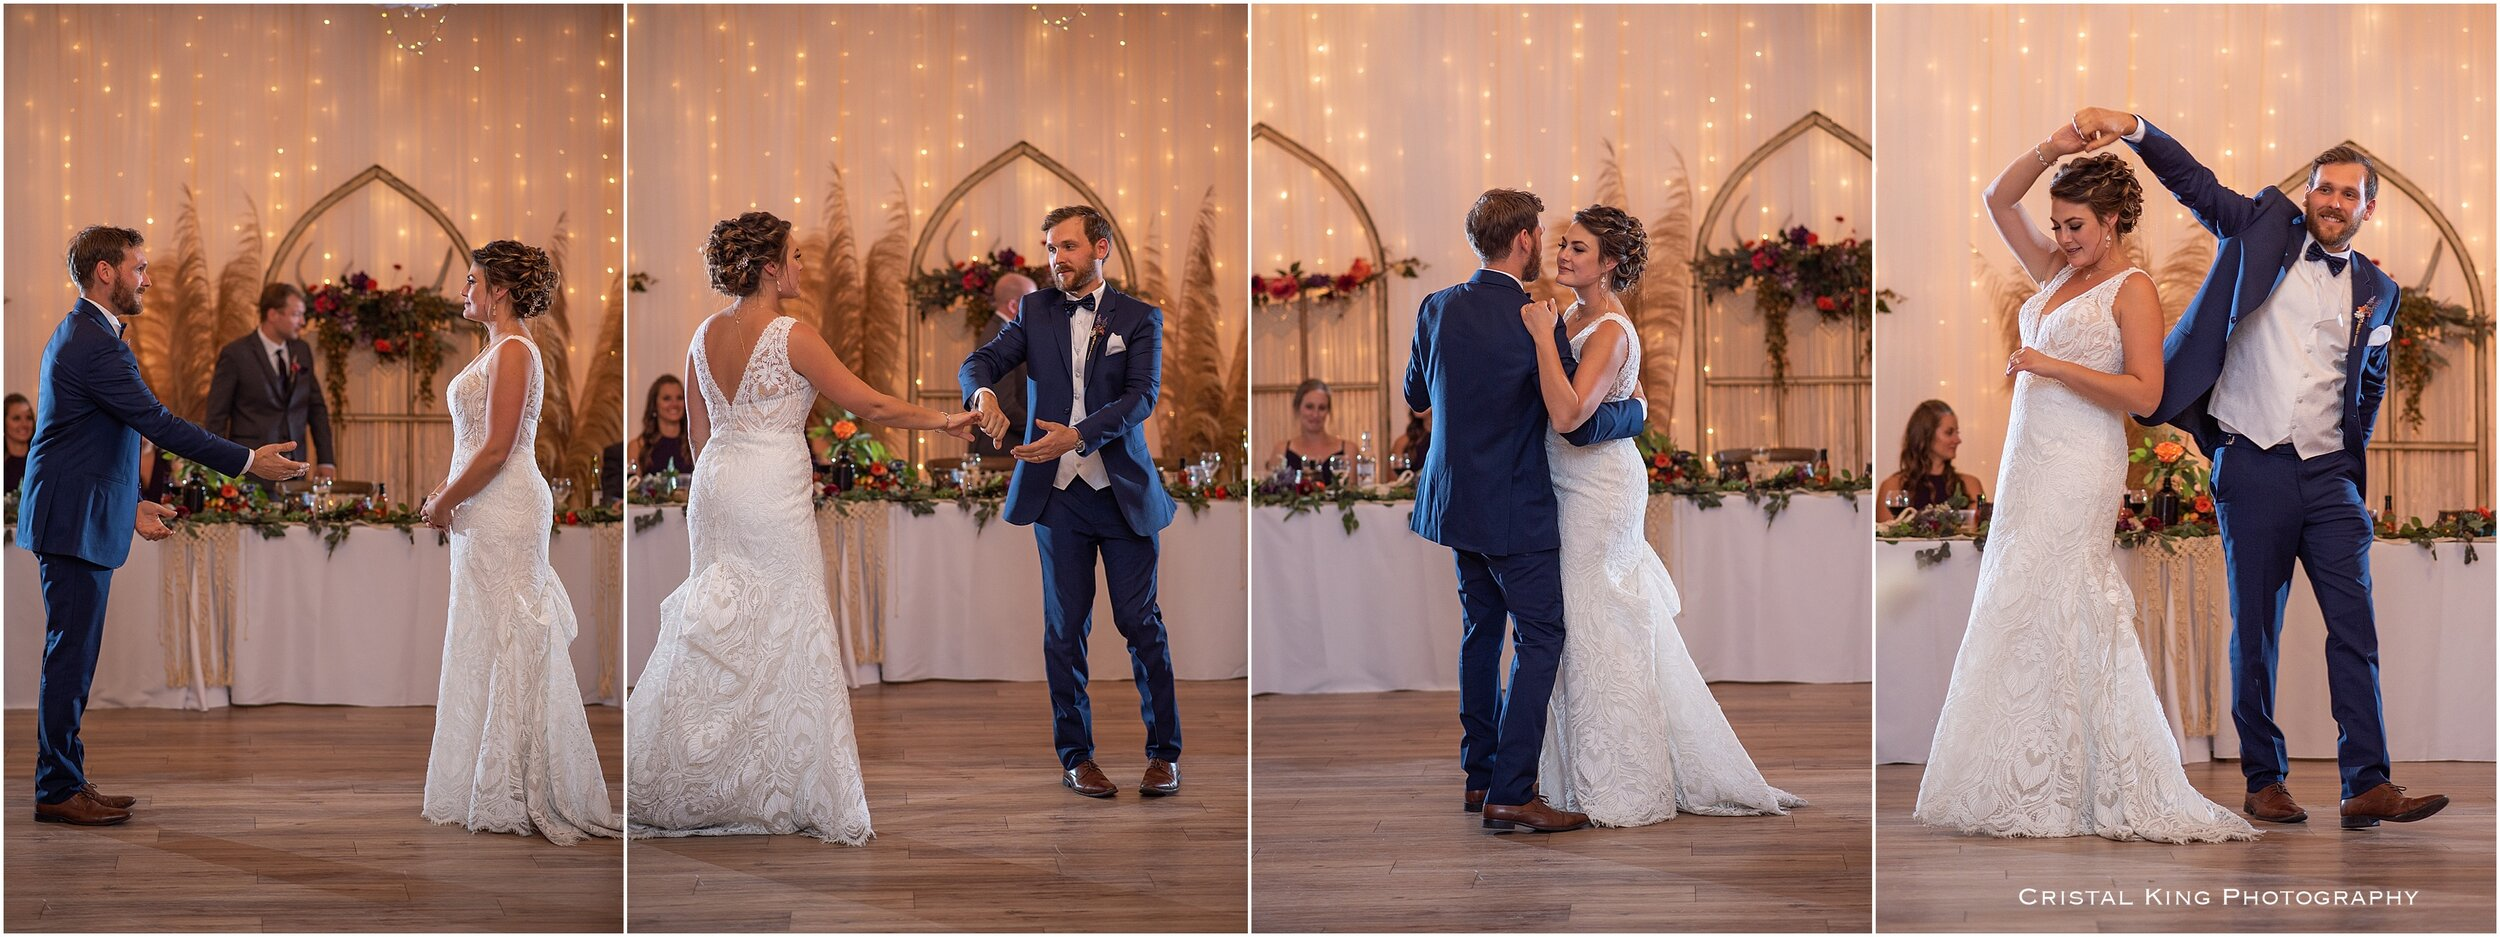 Sarah & Shaun's Wedding-180.jpg